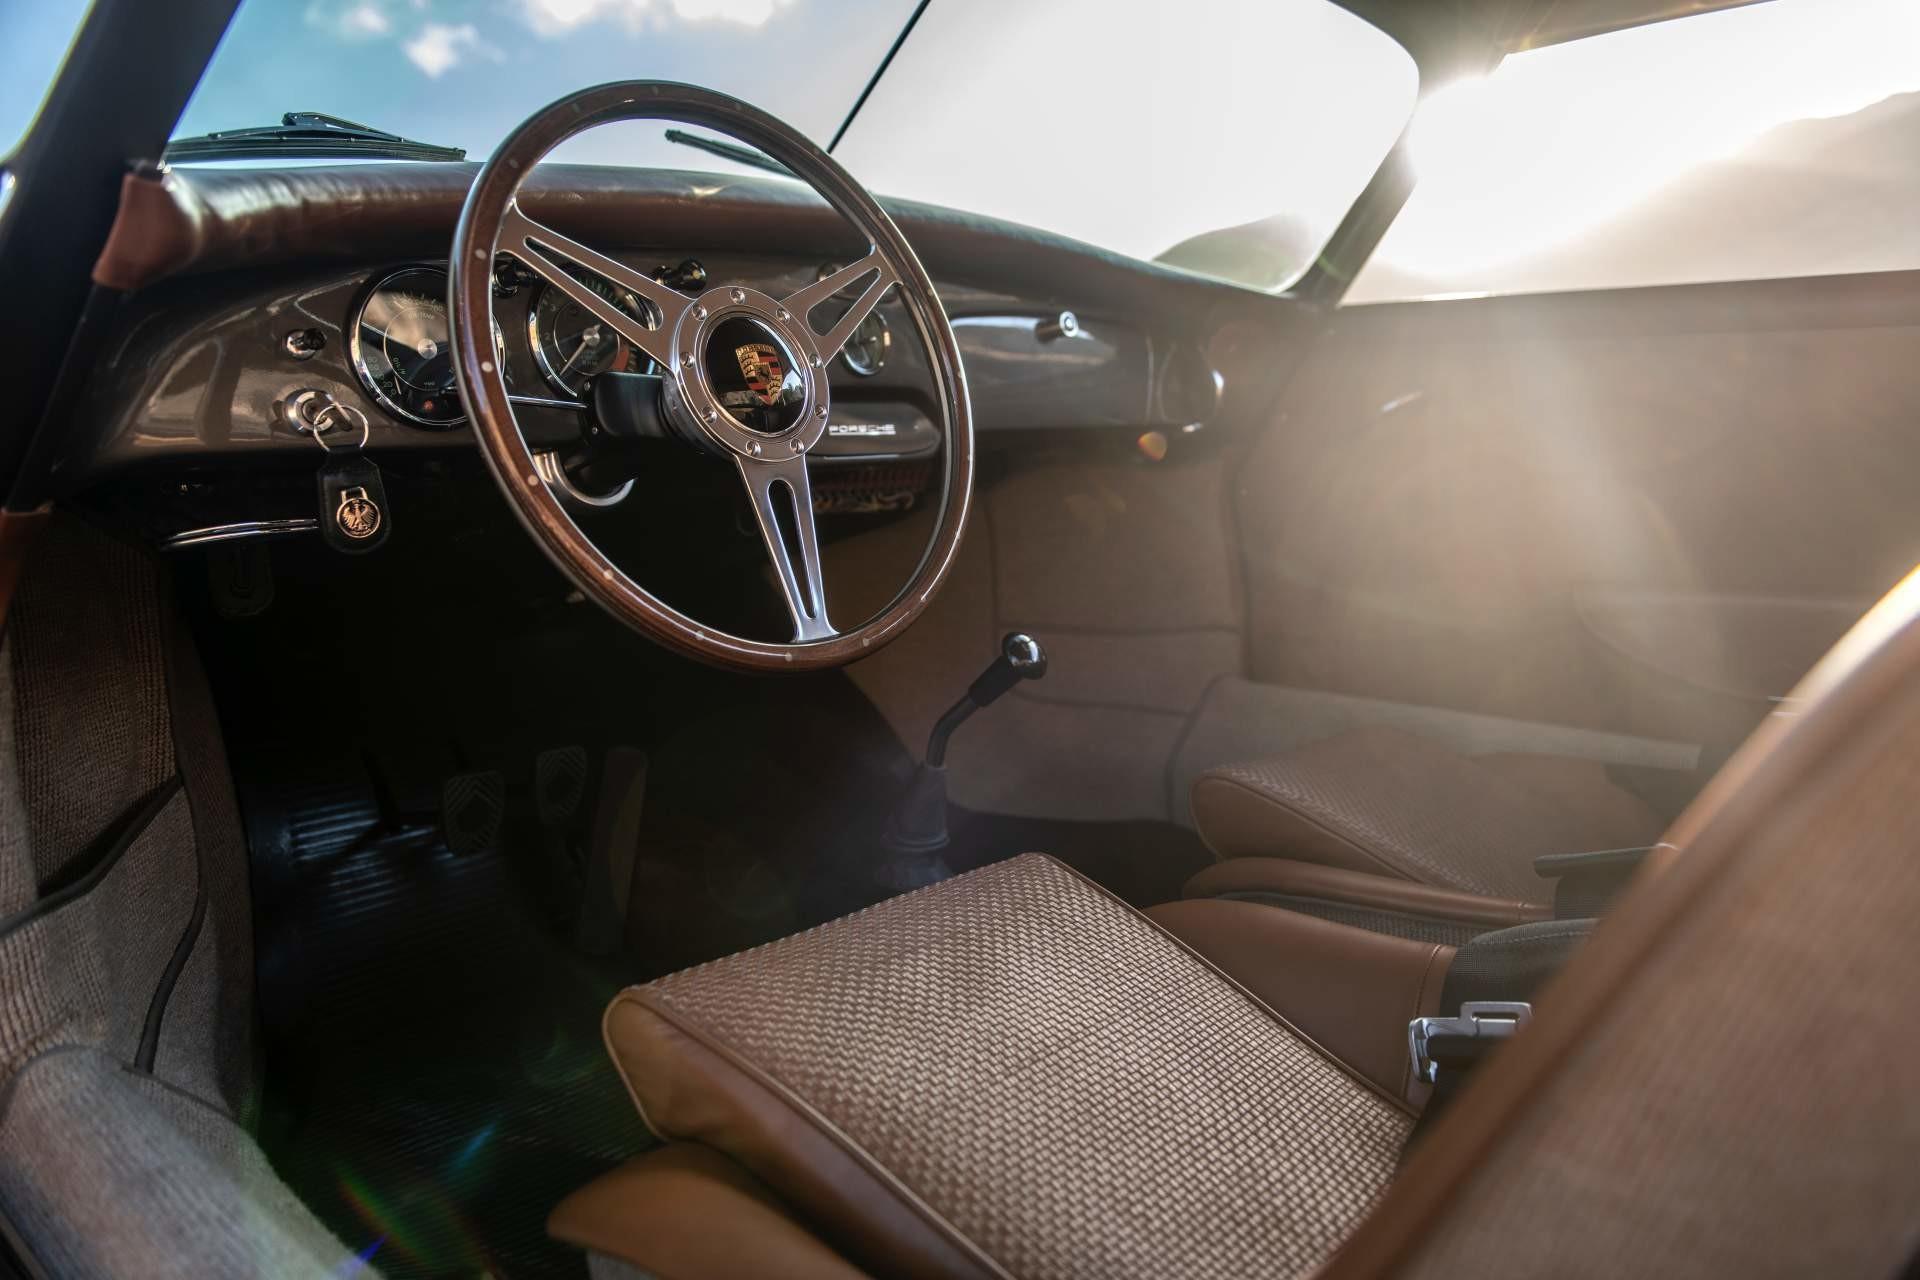 Emory Motorsports Porsche 356 restomod